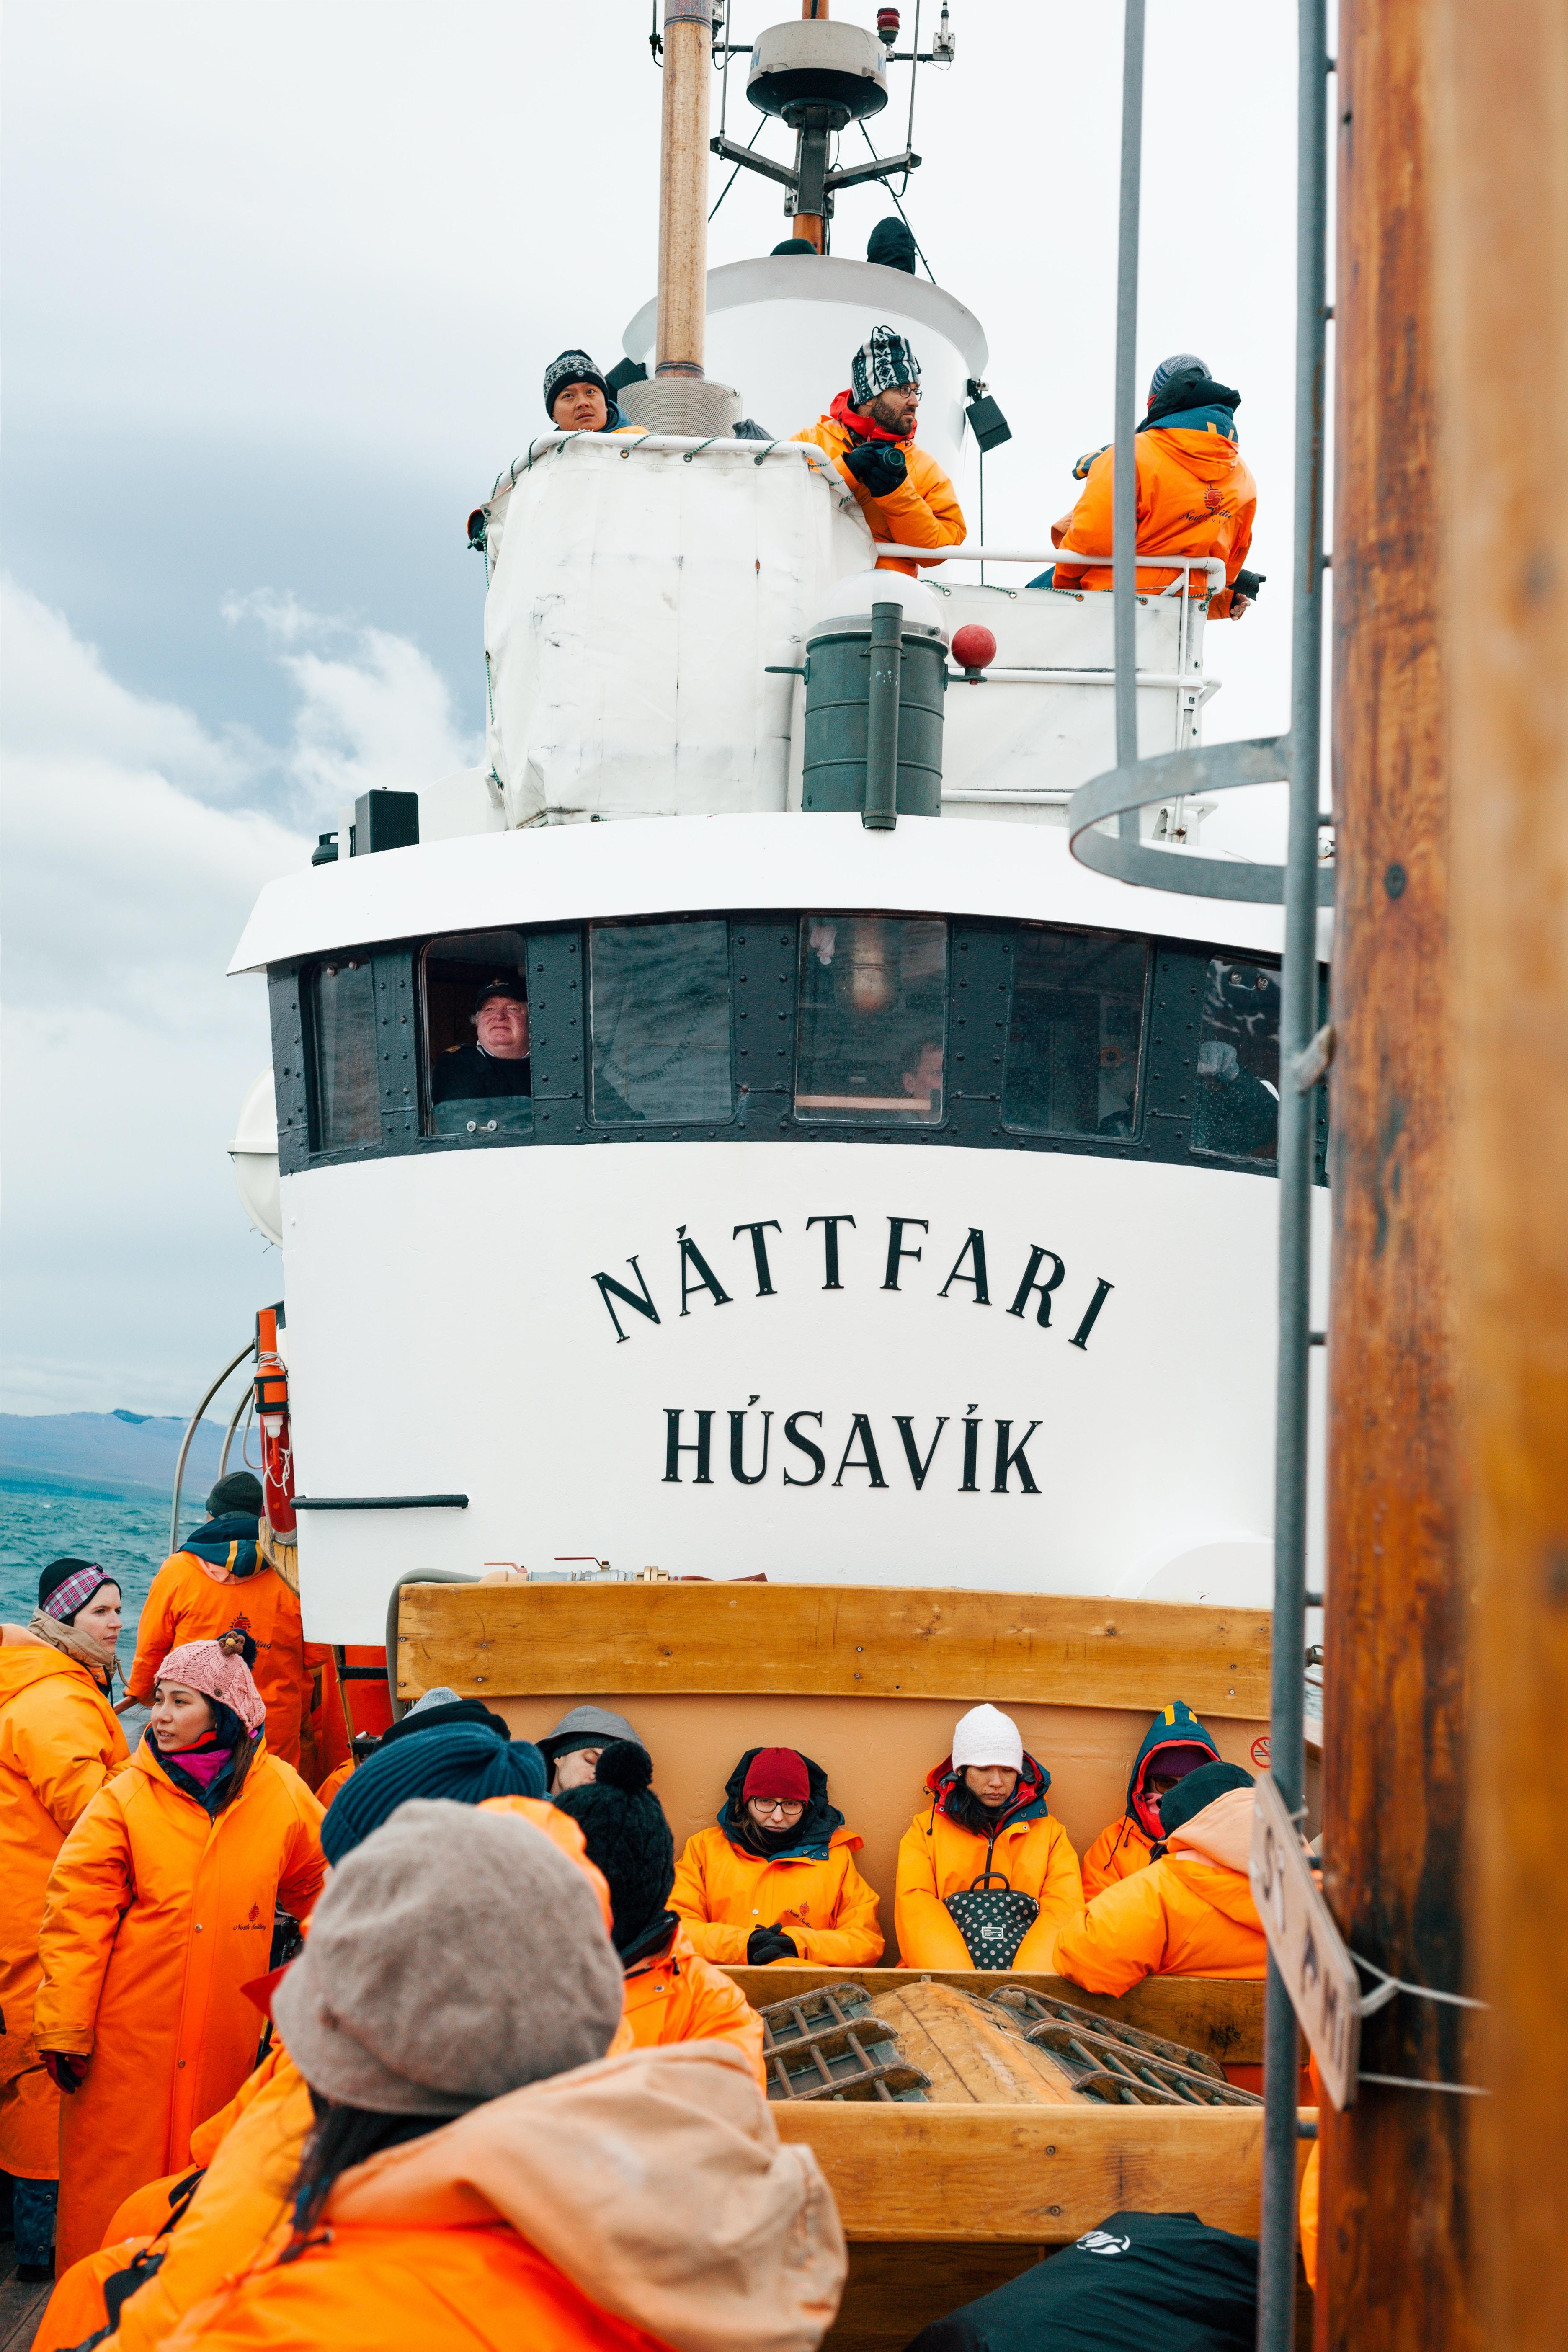 people on white Nattfari Husavik ship on body of water during cloudy weather